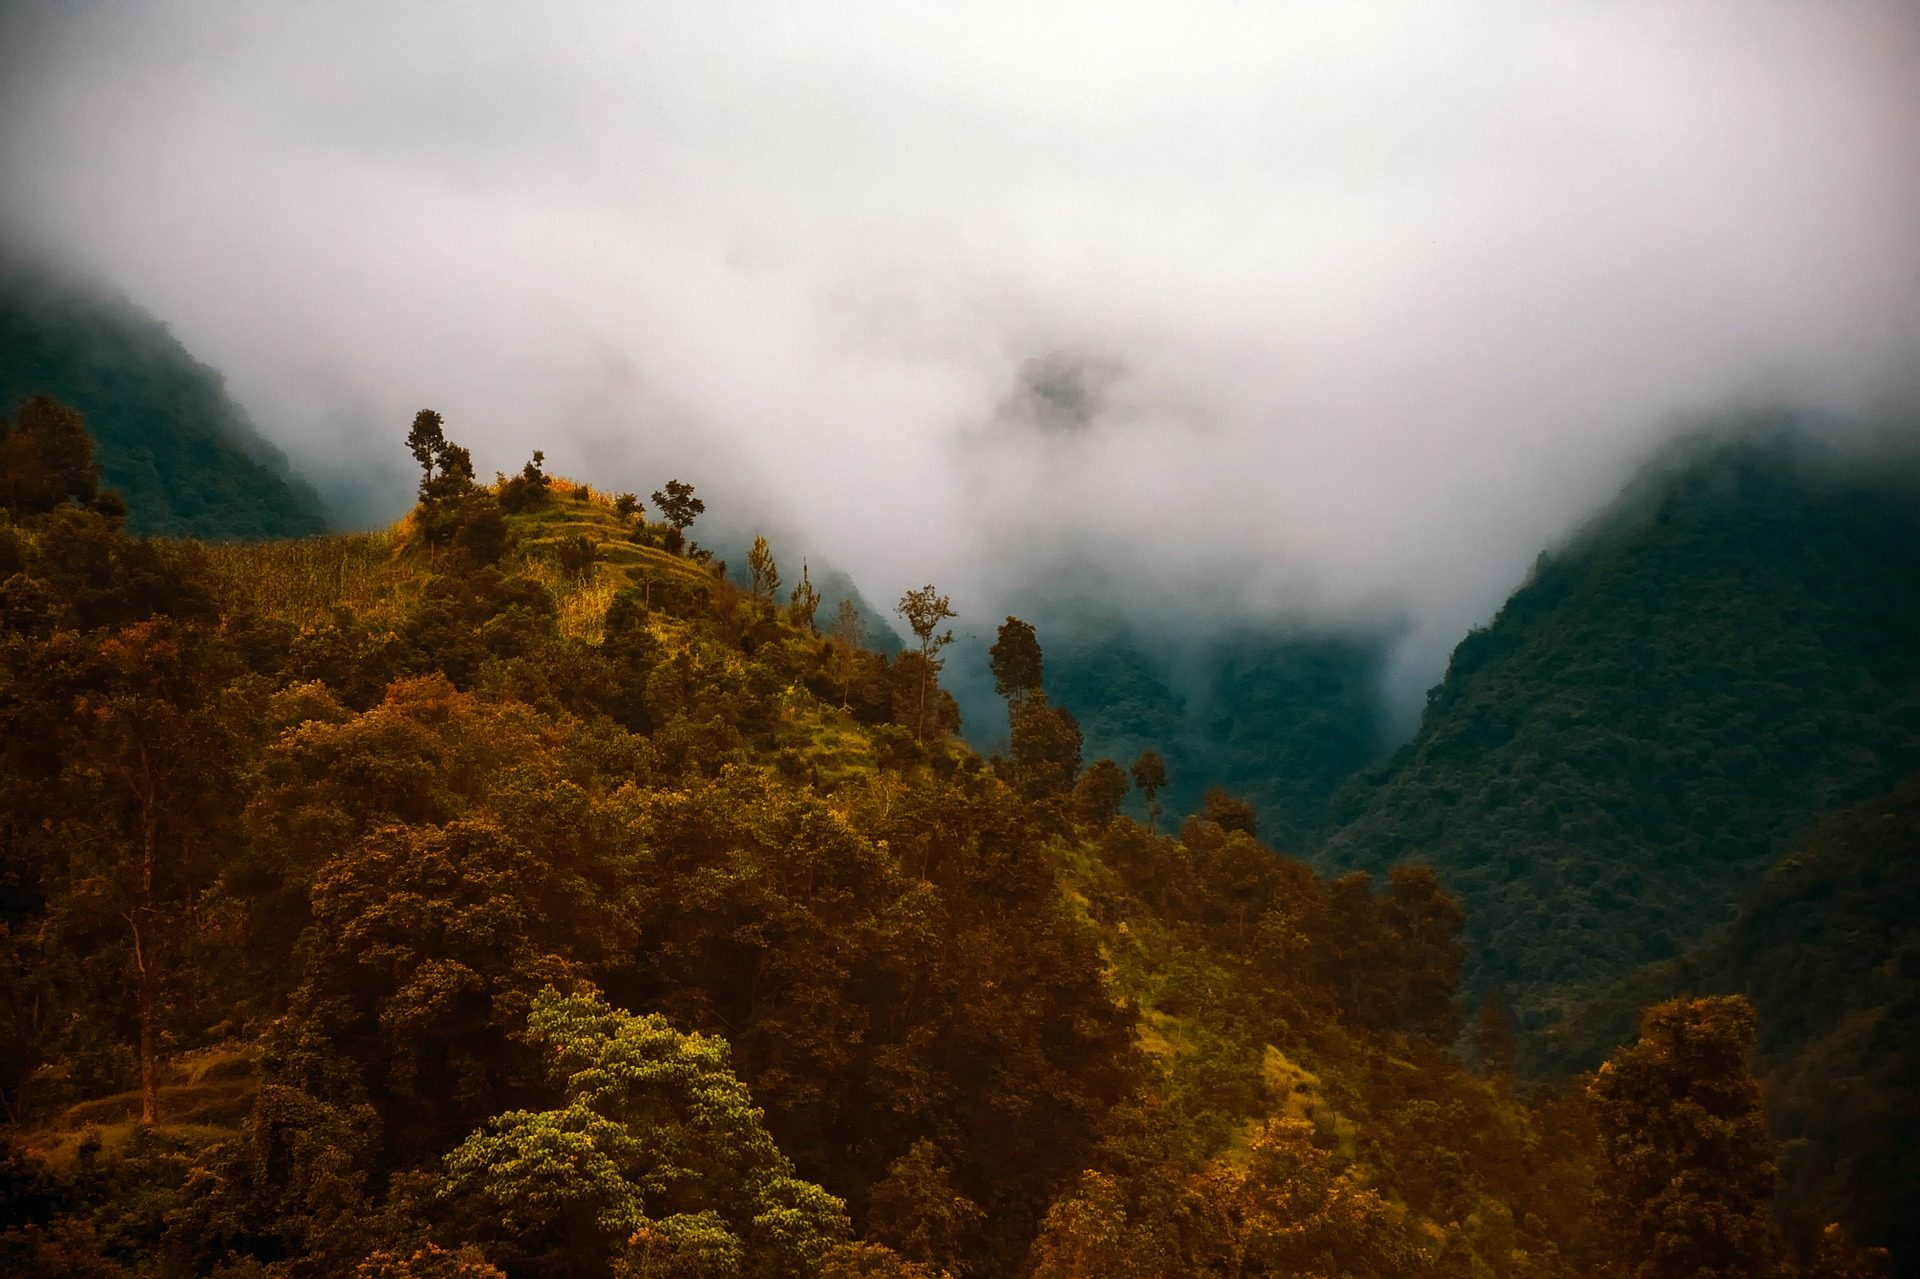 Montañas, κοιλάδες, βλάστηση, δέντρα, ομίχλη, Νεπάλ - Wallpapers HD - Professor-falken.com